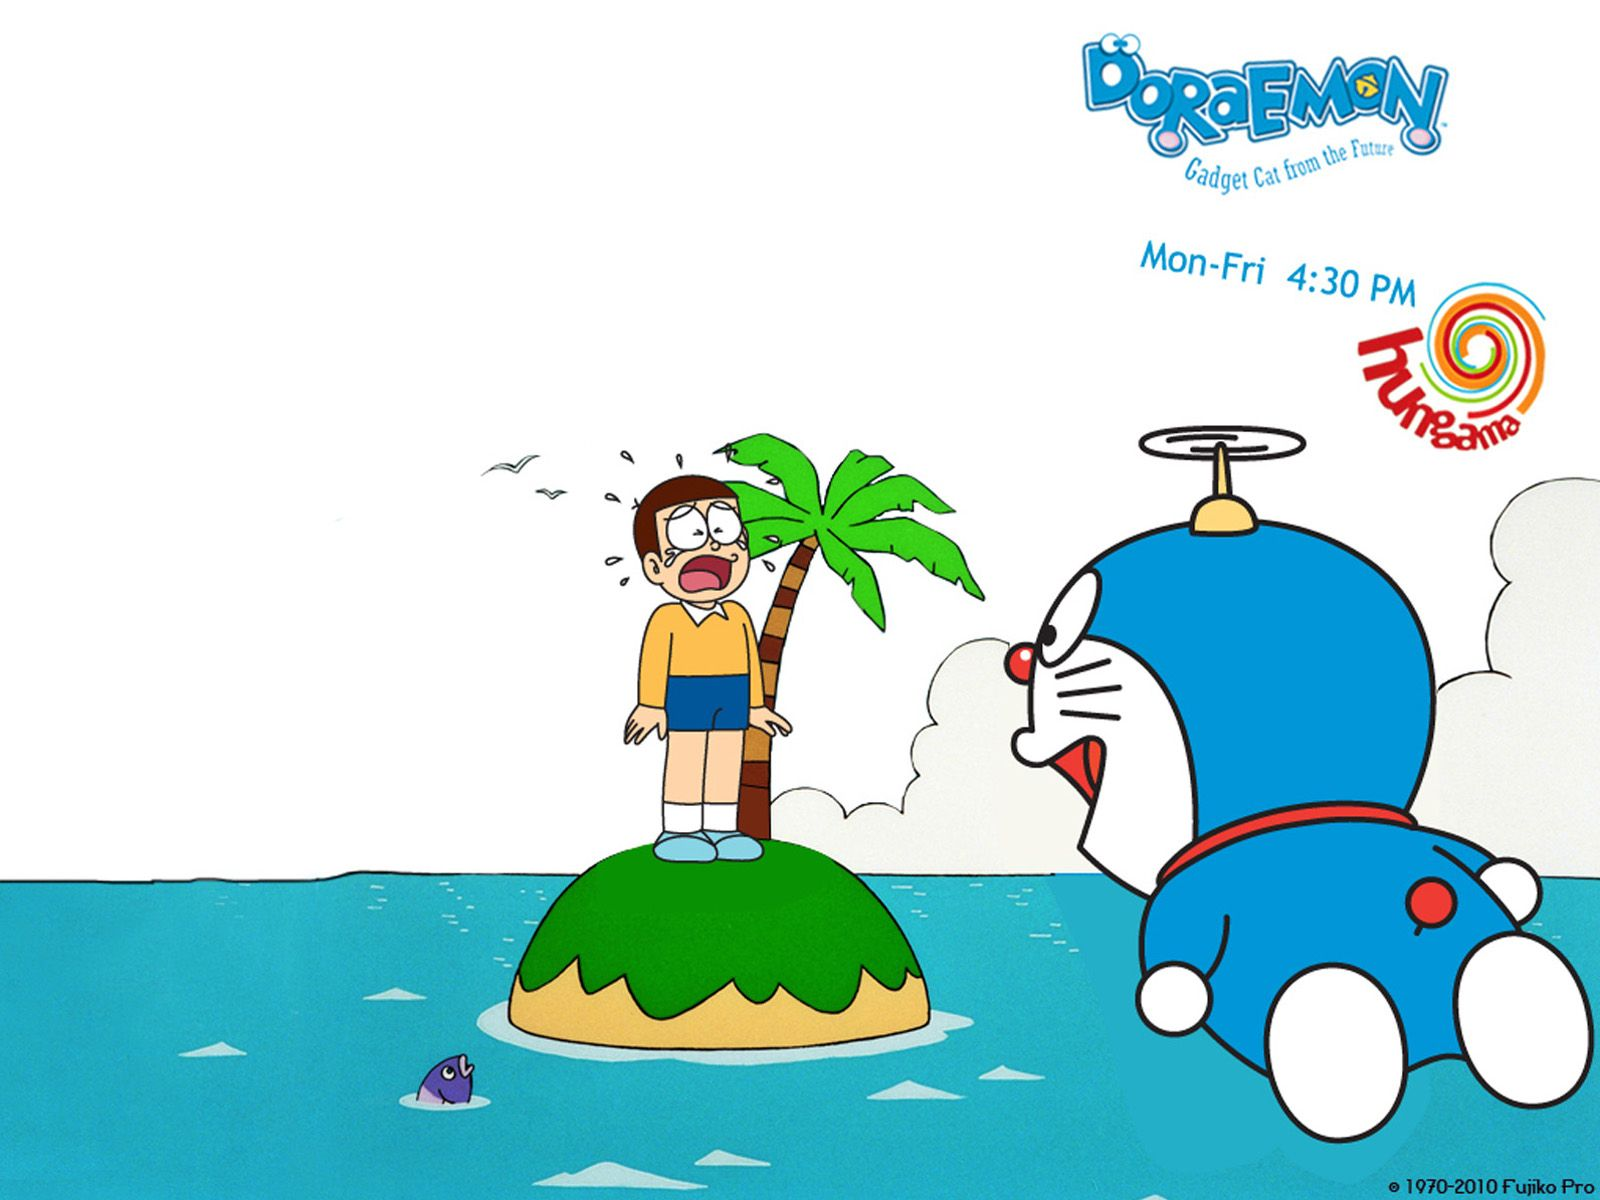 Download wallpaper doraemon free - Wallpapers Of Doraemon 1920 1080 Doraemon Images Wallpapers 50 Wallpapers Adorable Wallpapers